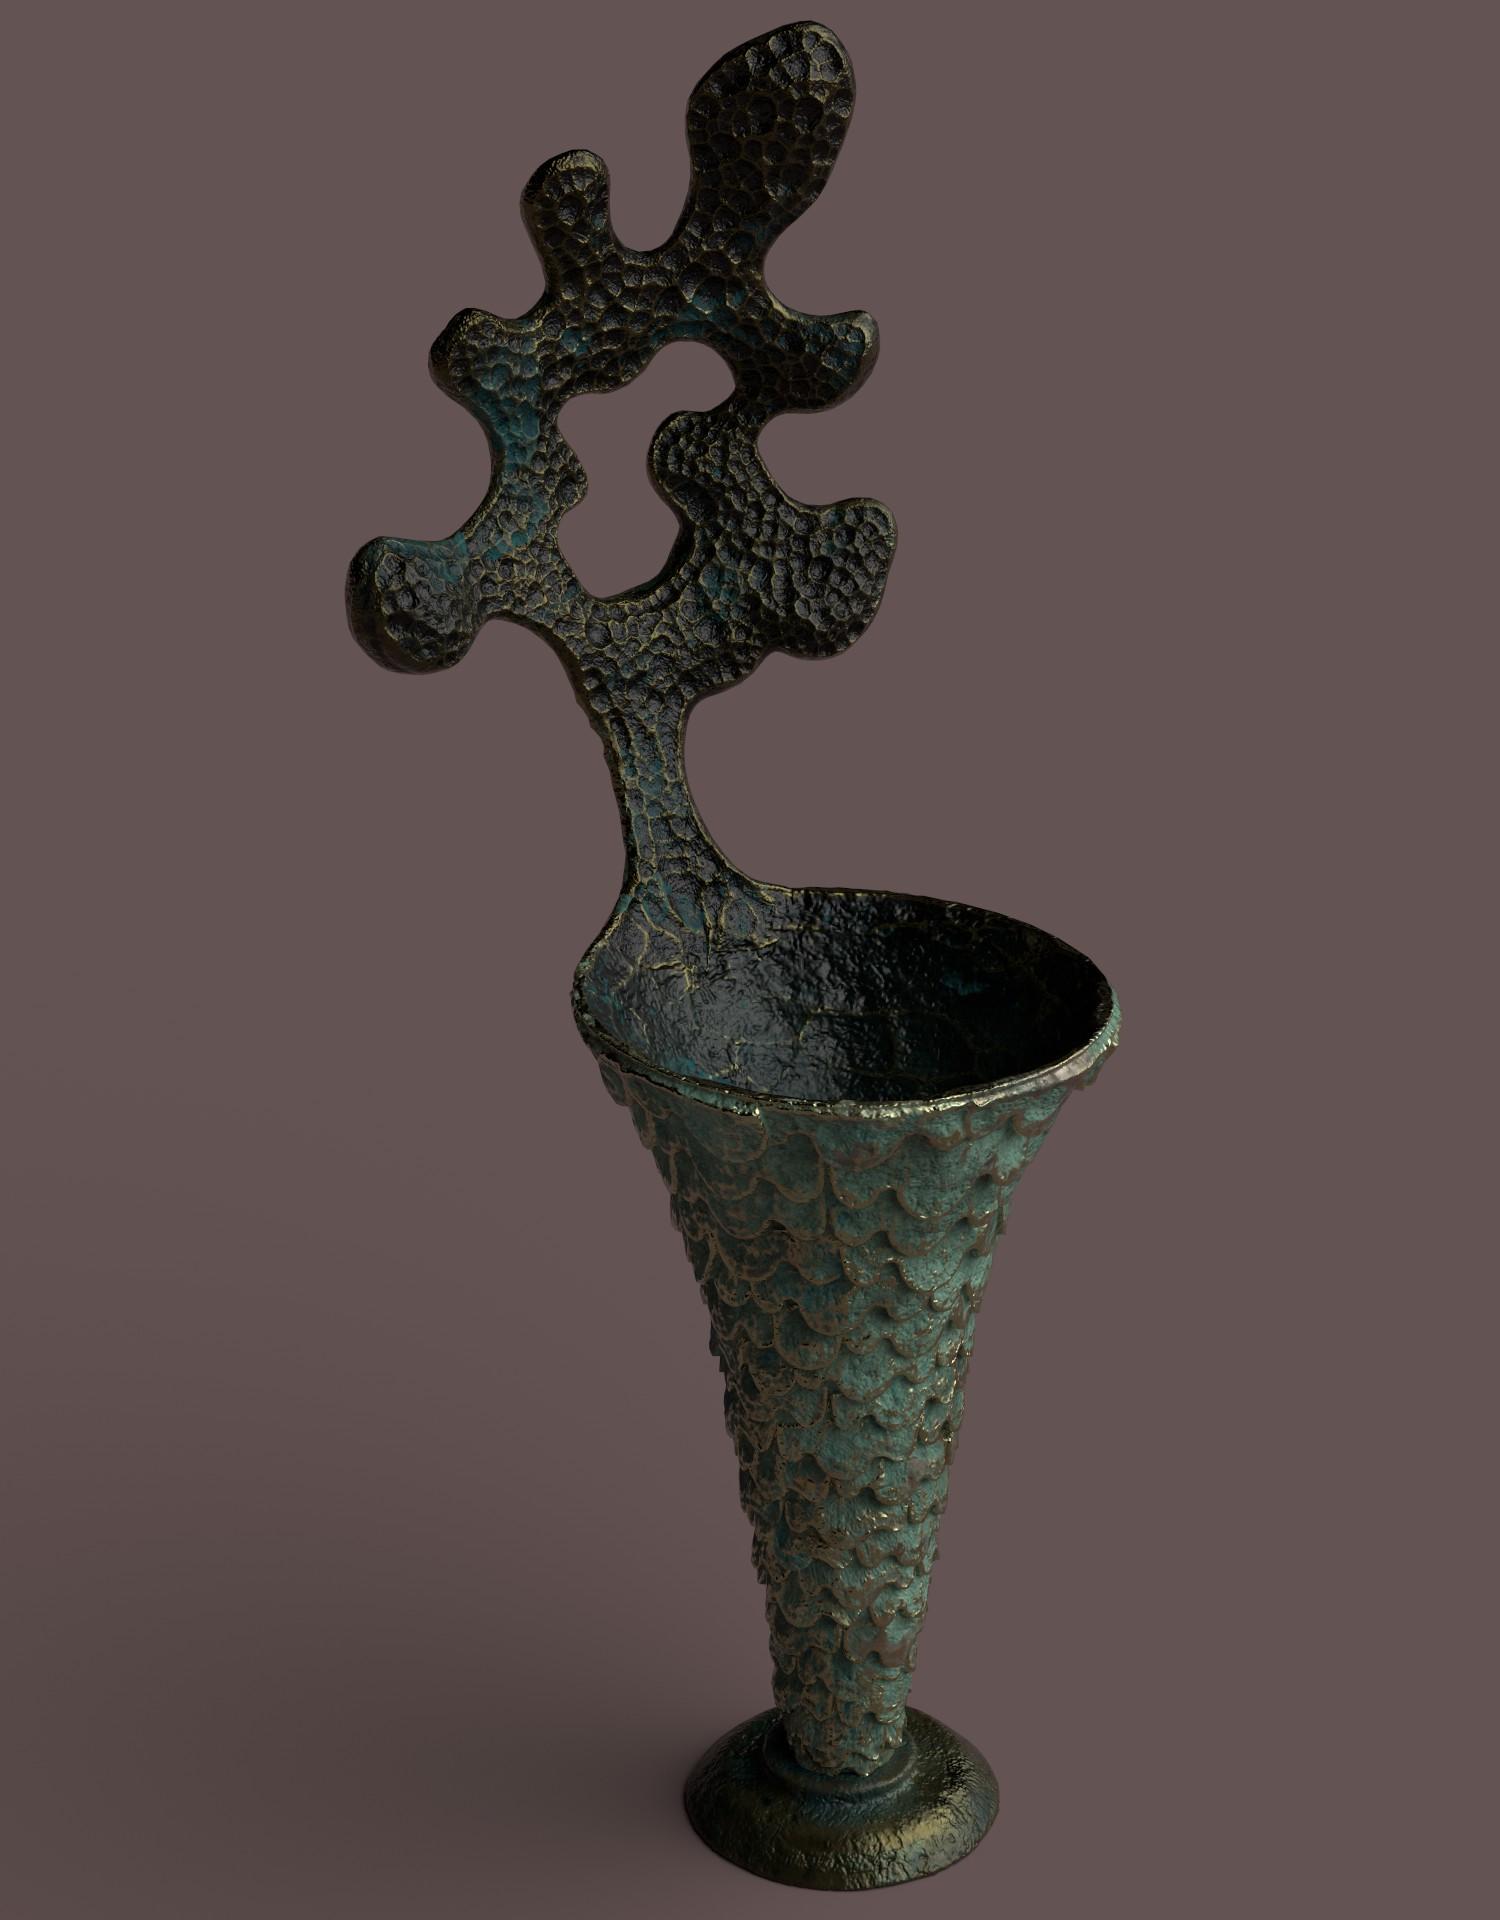 PAINTER vase ecaille 2 render test 5